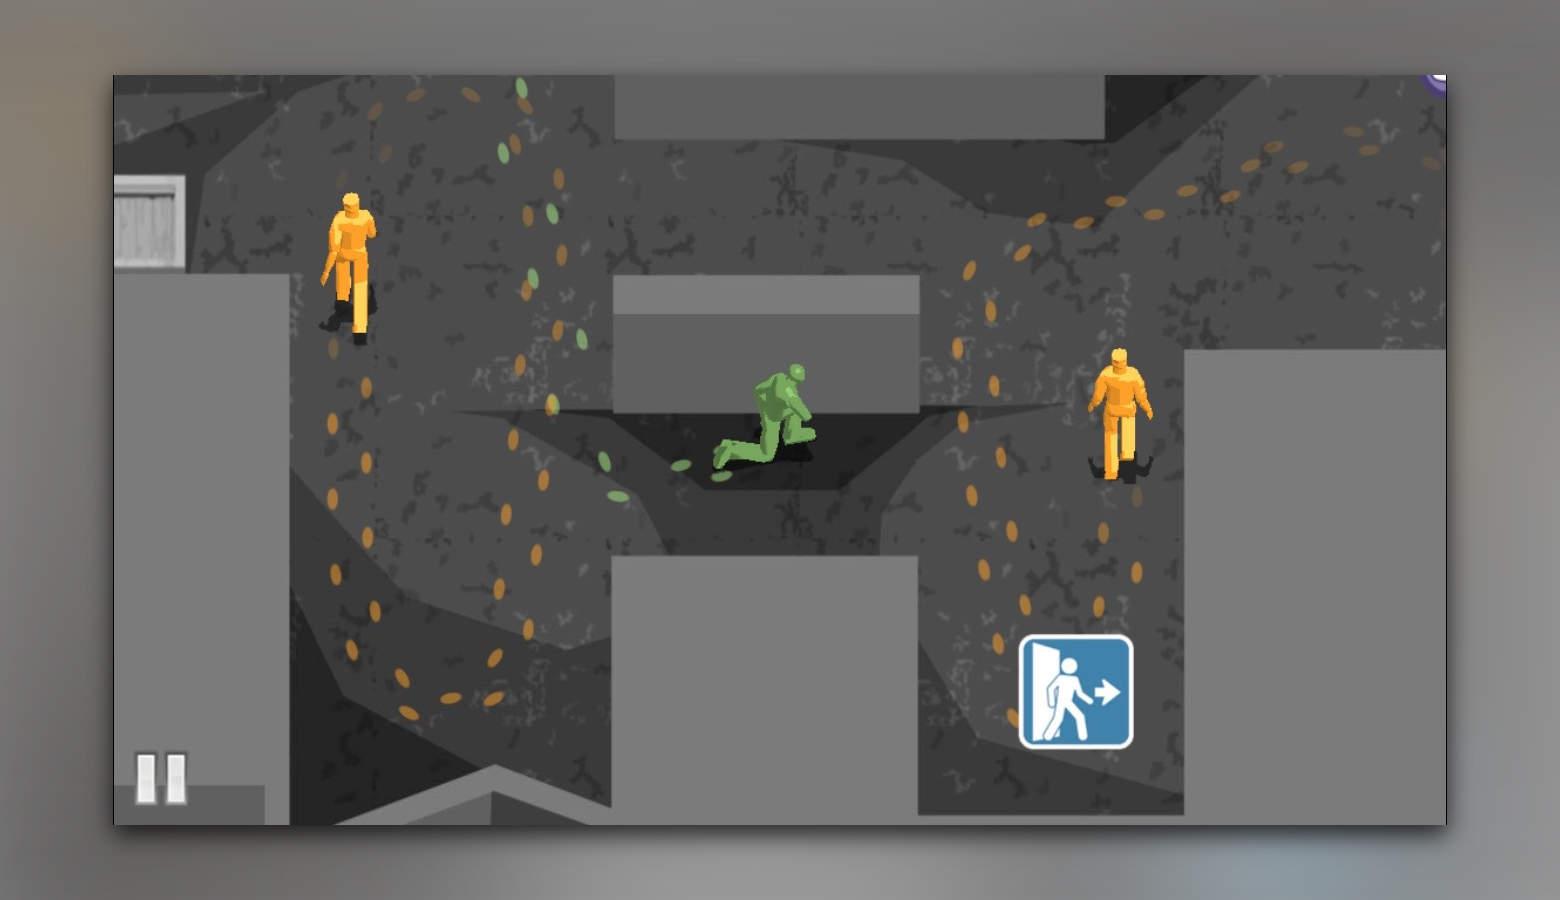 rogue-alert-gameplay - 4